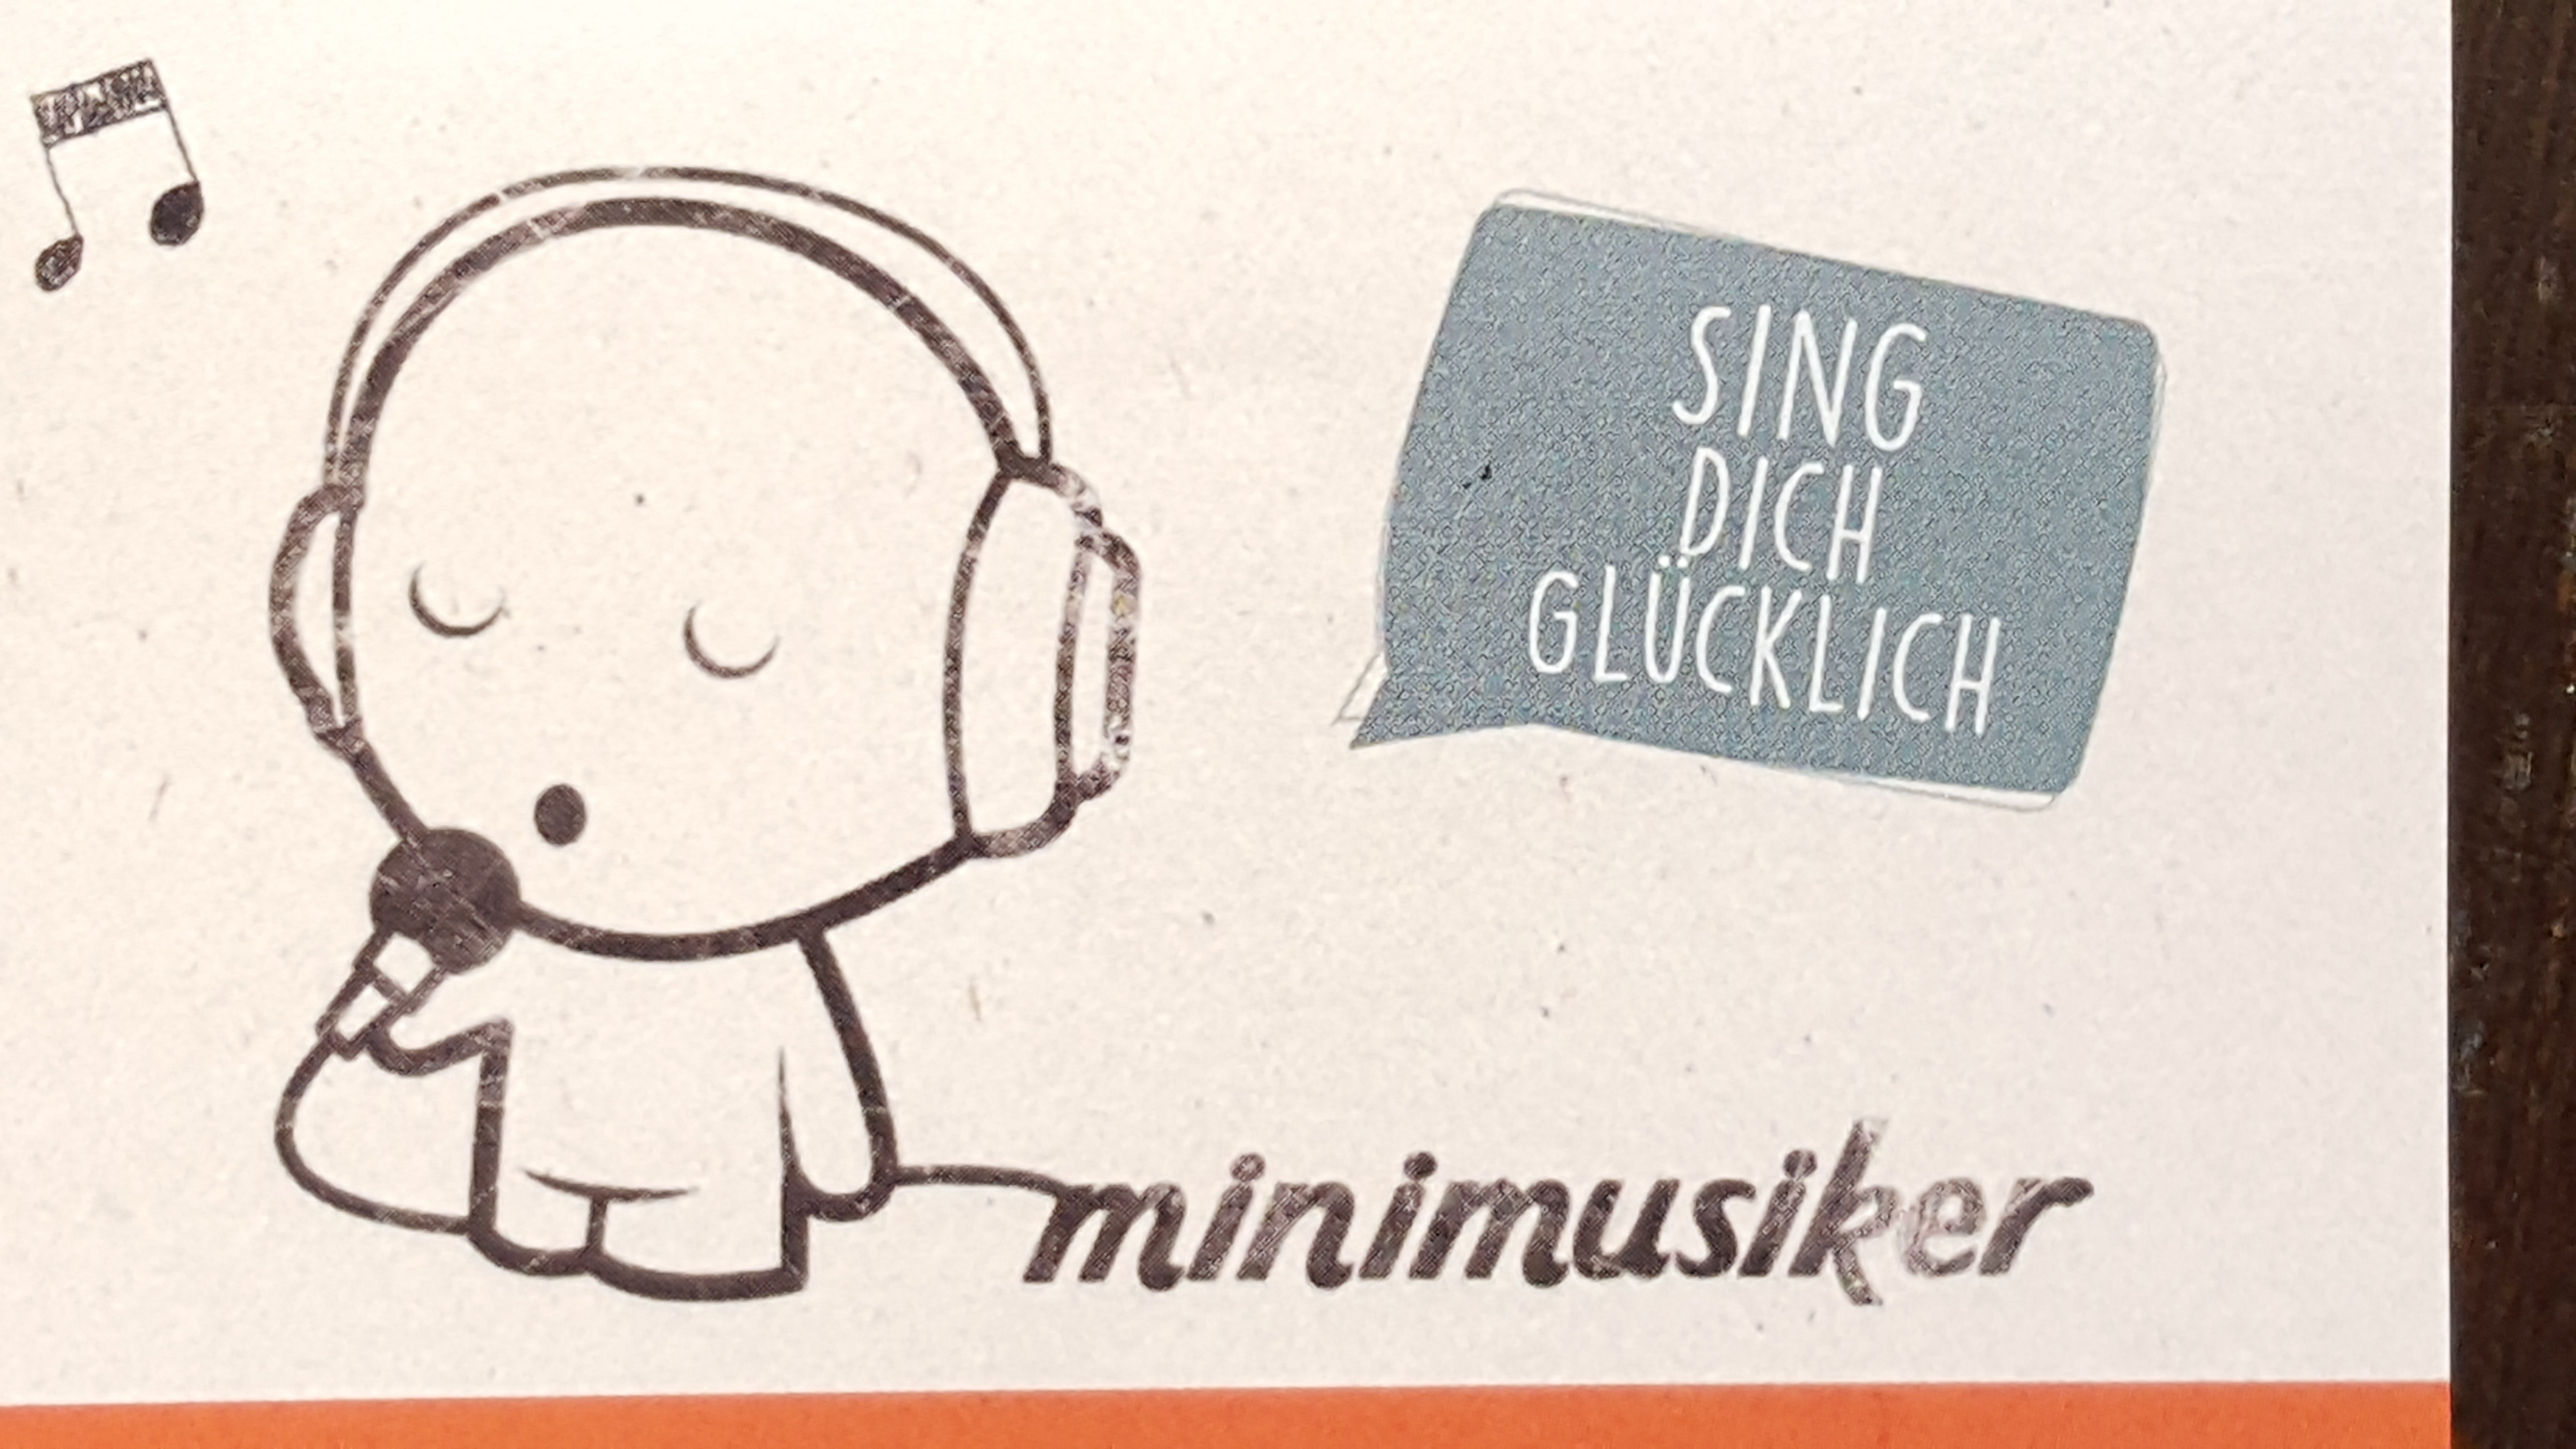 Minimusiker